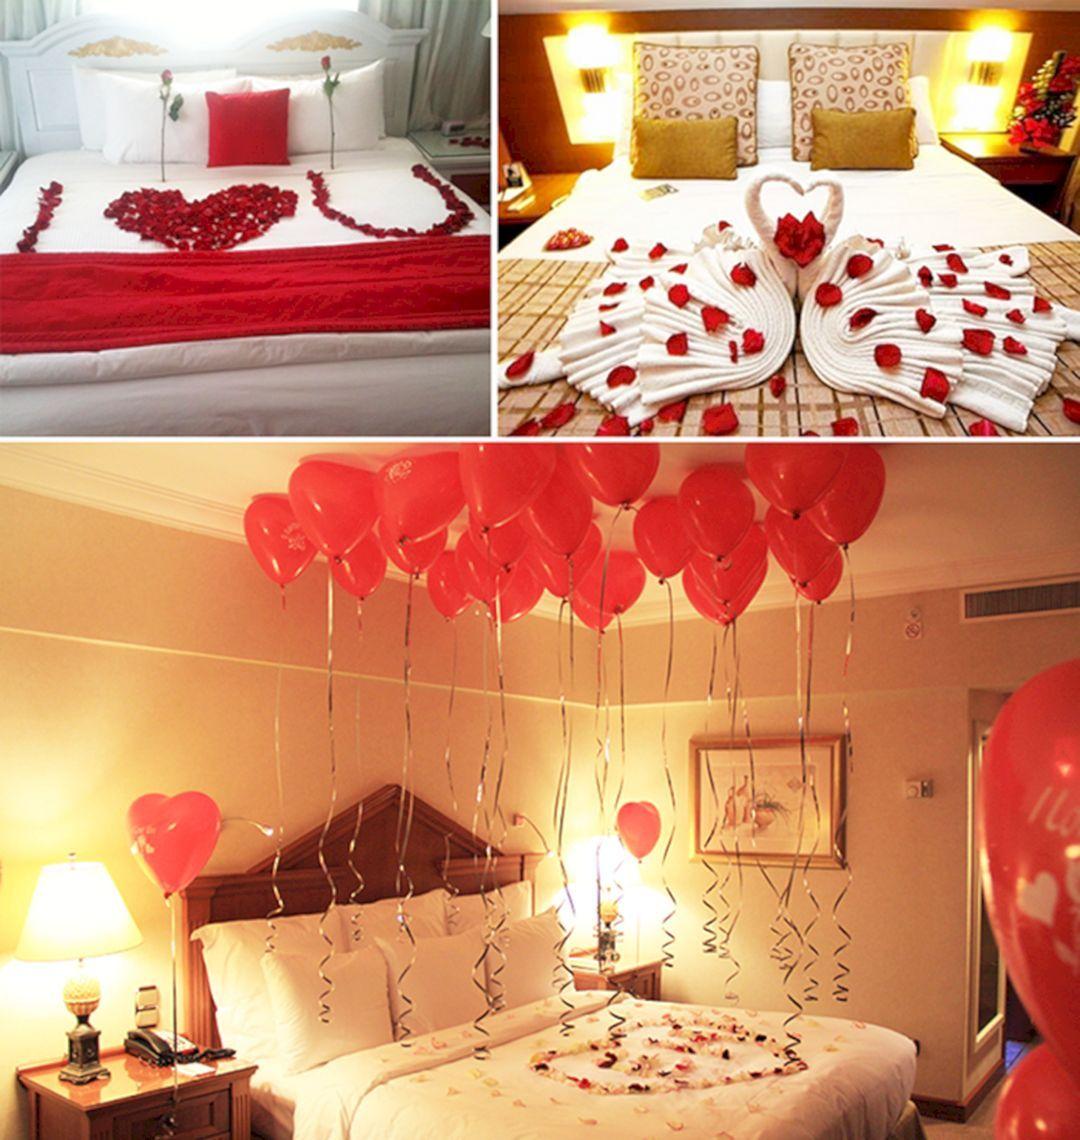 Beautiful Romantic Bedroom Design: 12+ Beautiful Romantic Bedroom Design And Decoration Ideas